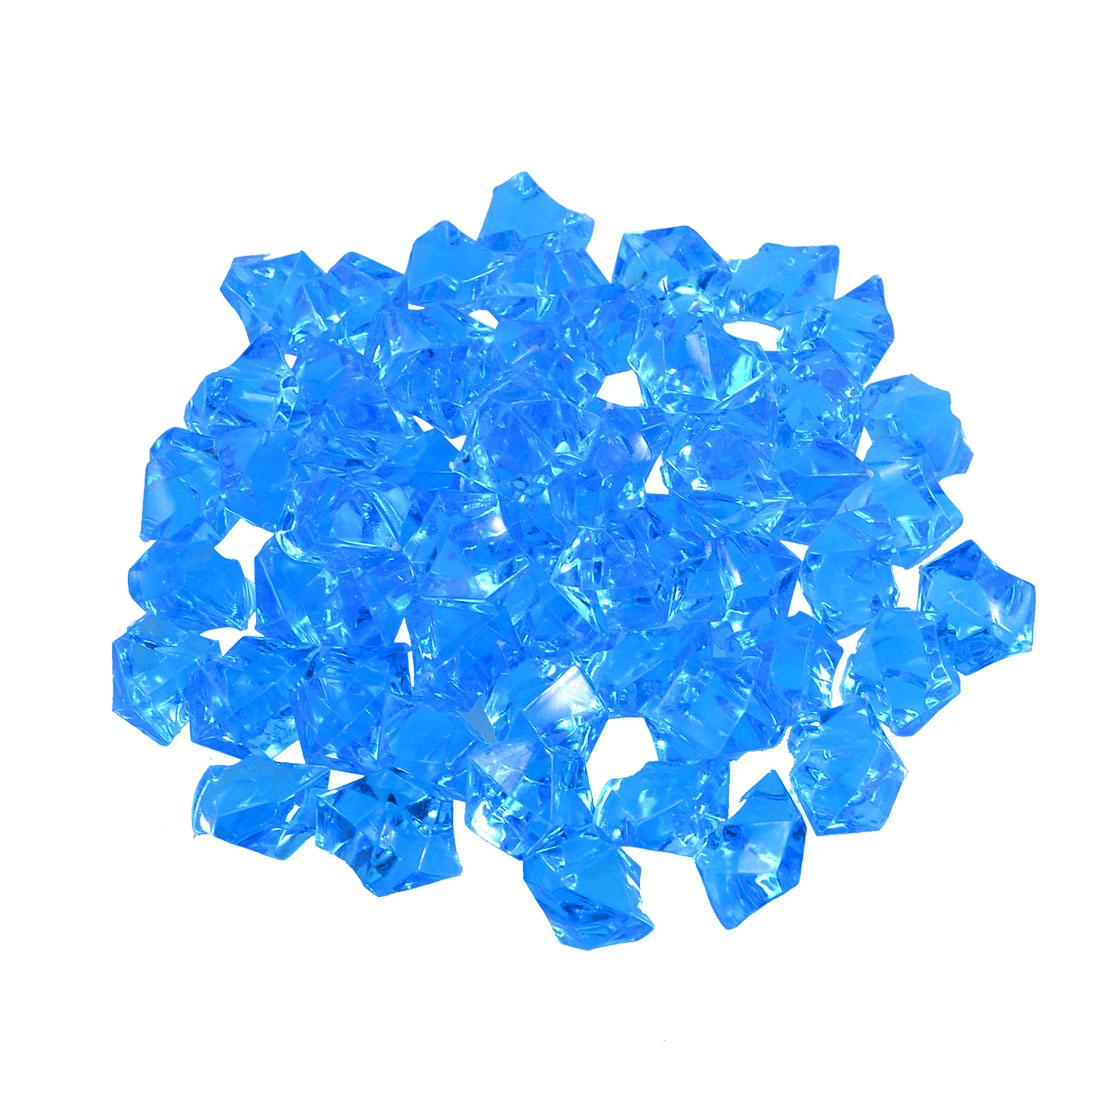 60 Pcs Blue Artifical Crystals Ornament for Fish Tank